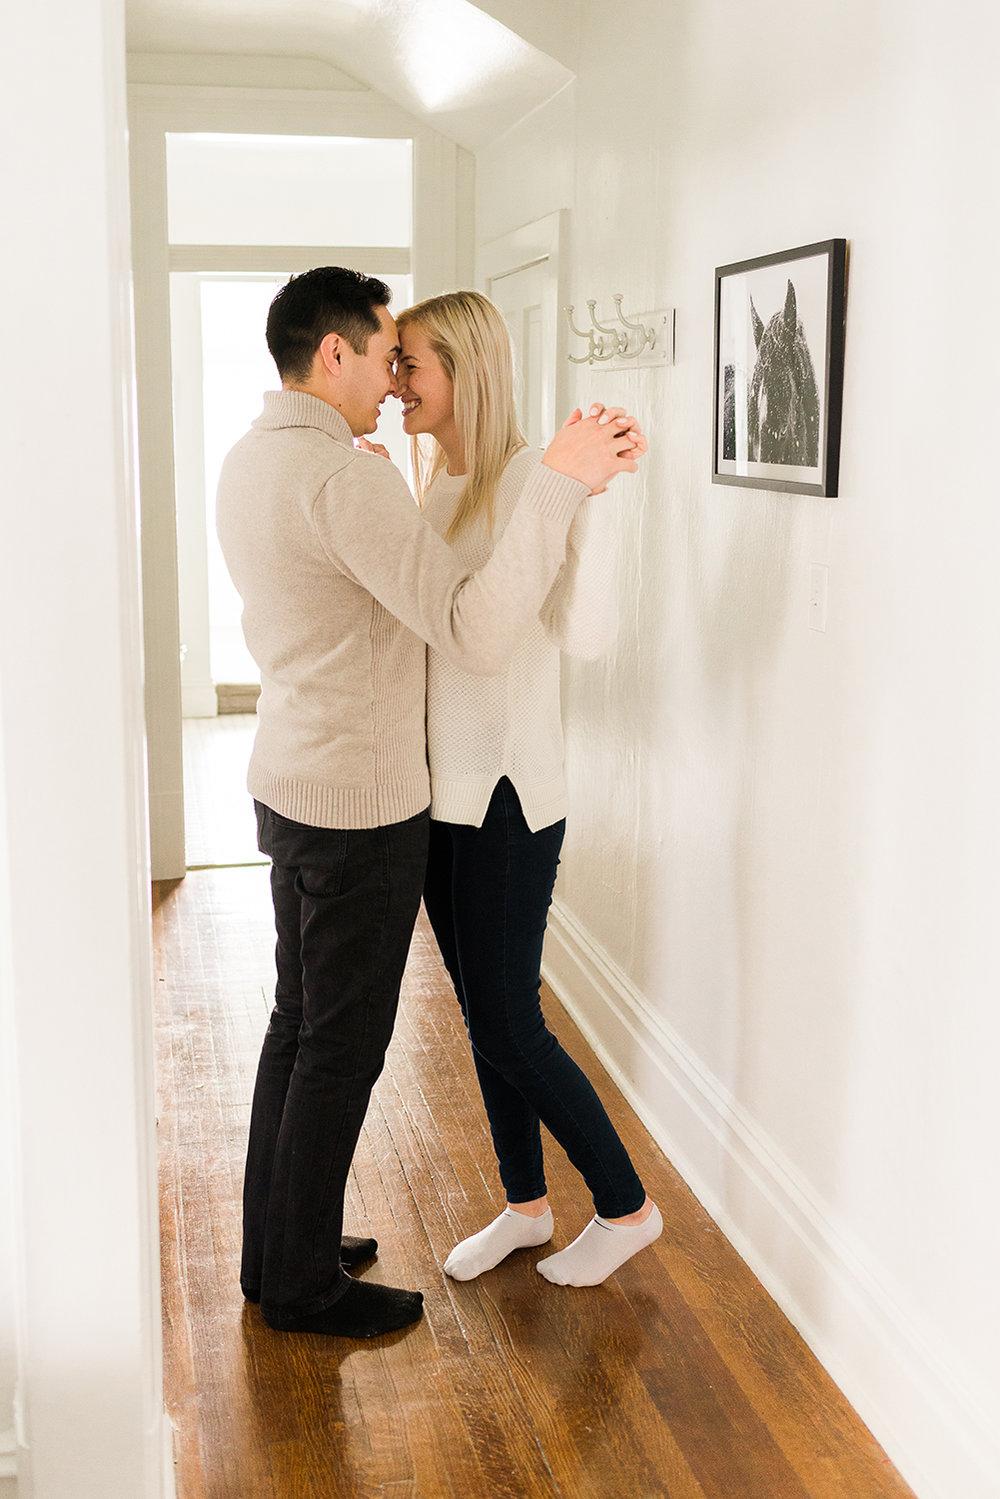 in-home-engagement-session-denver-engagement-photographer_63.jpg